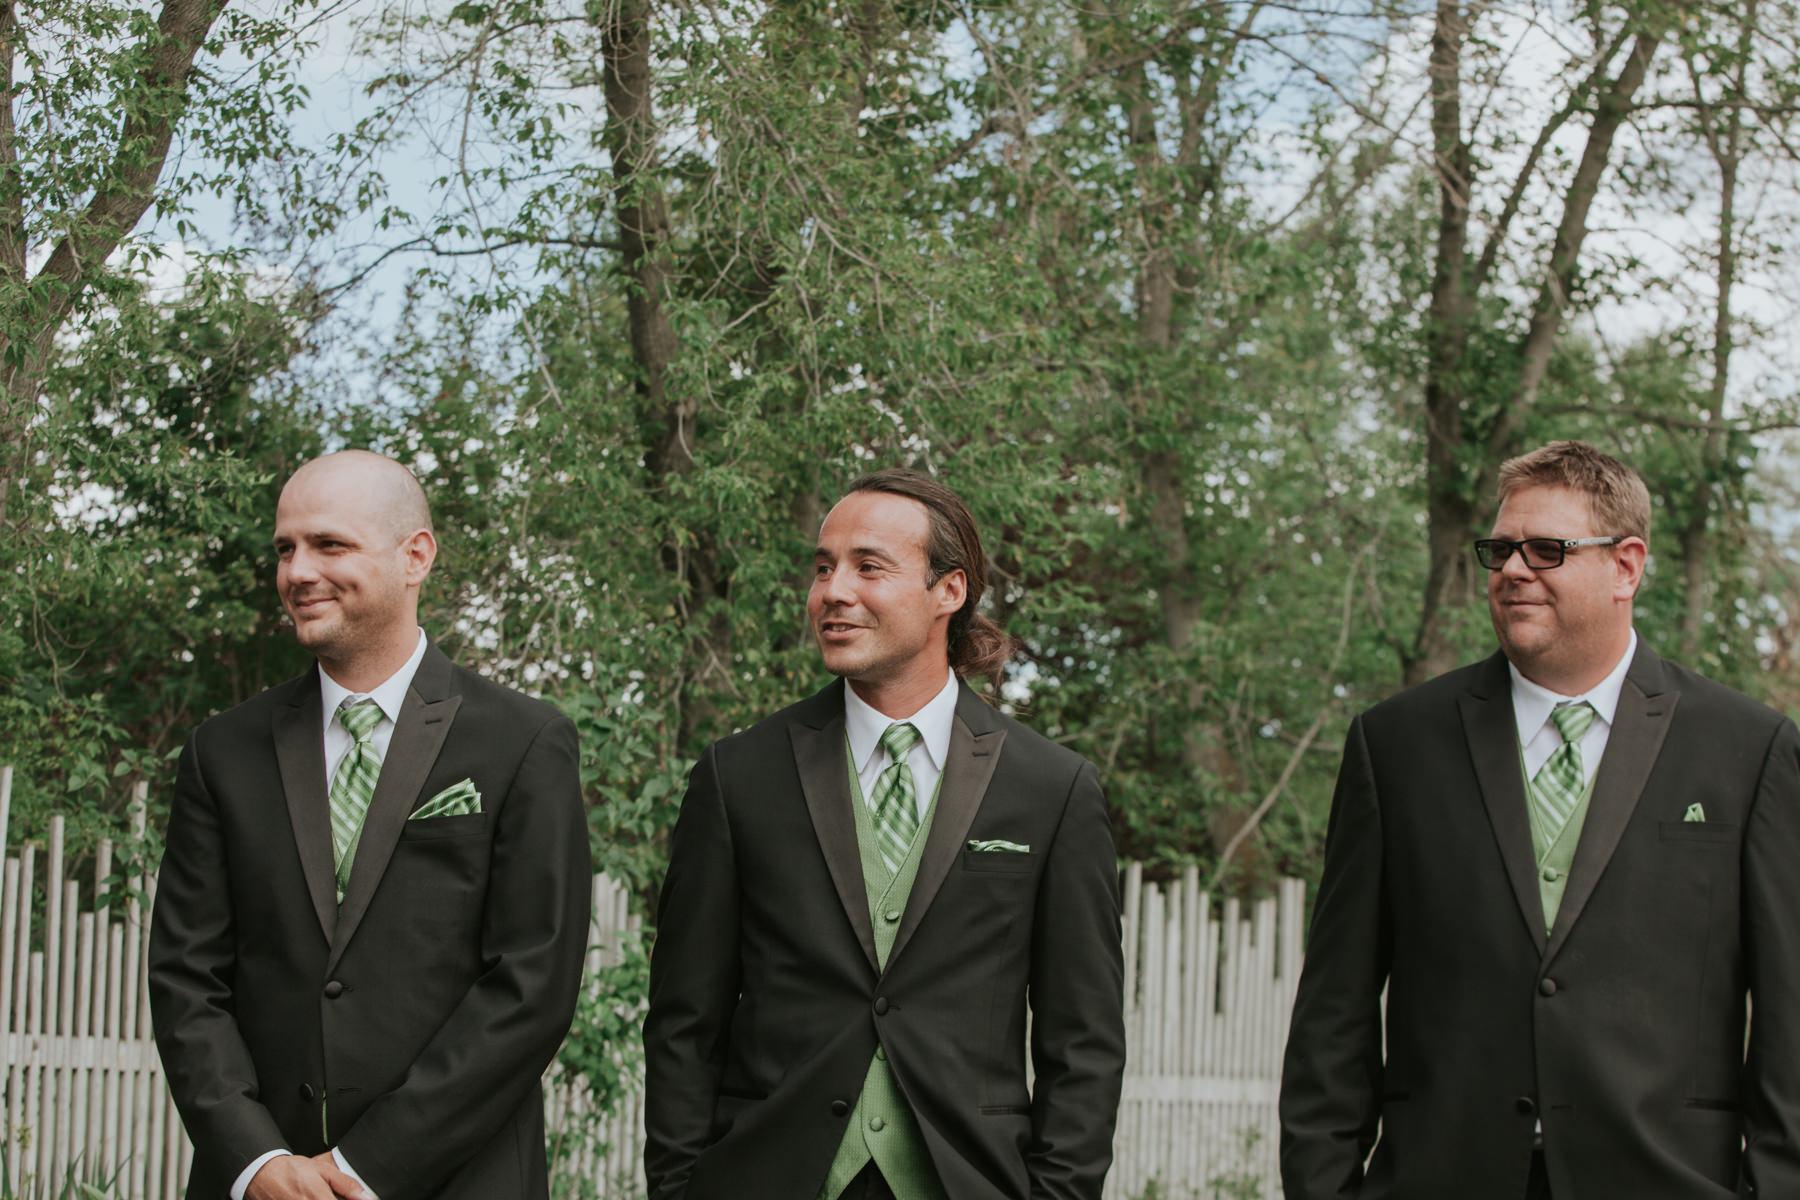 Vancouver Wedding Photographer Pam (30).jpg